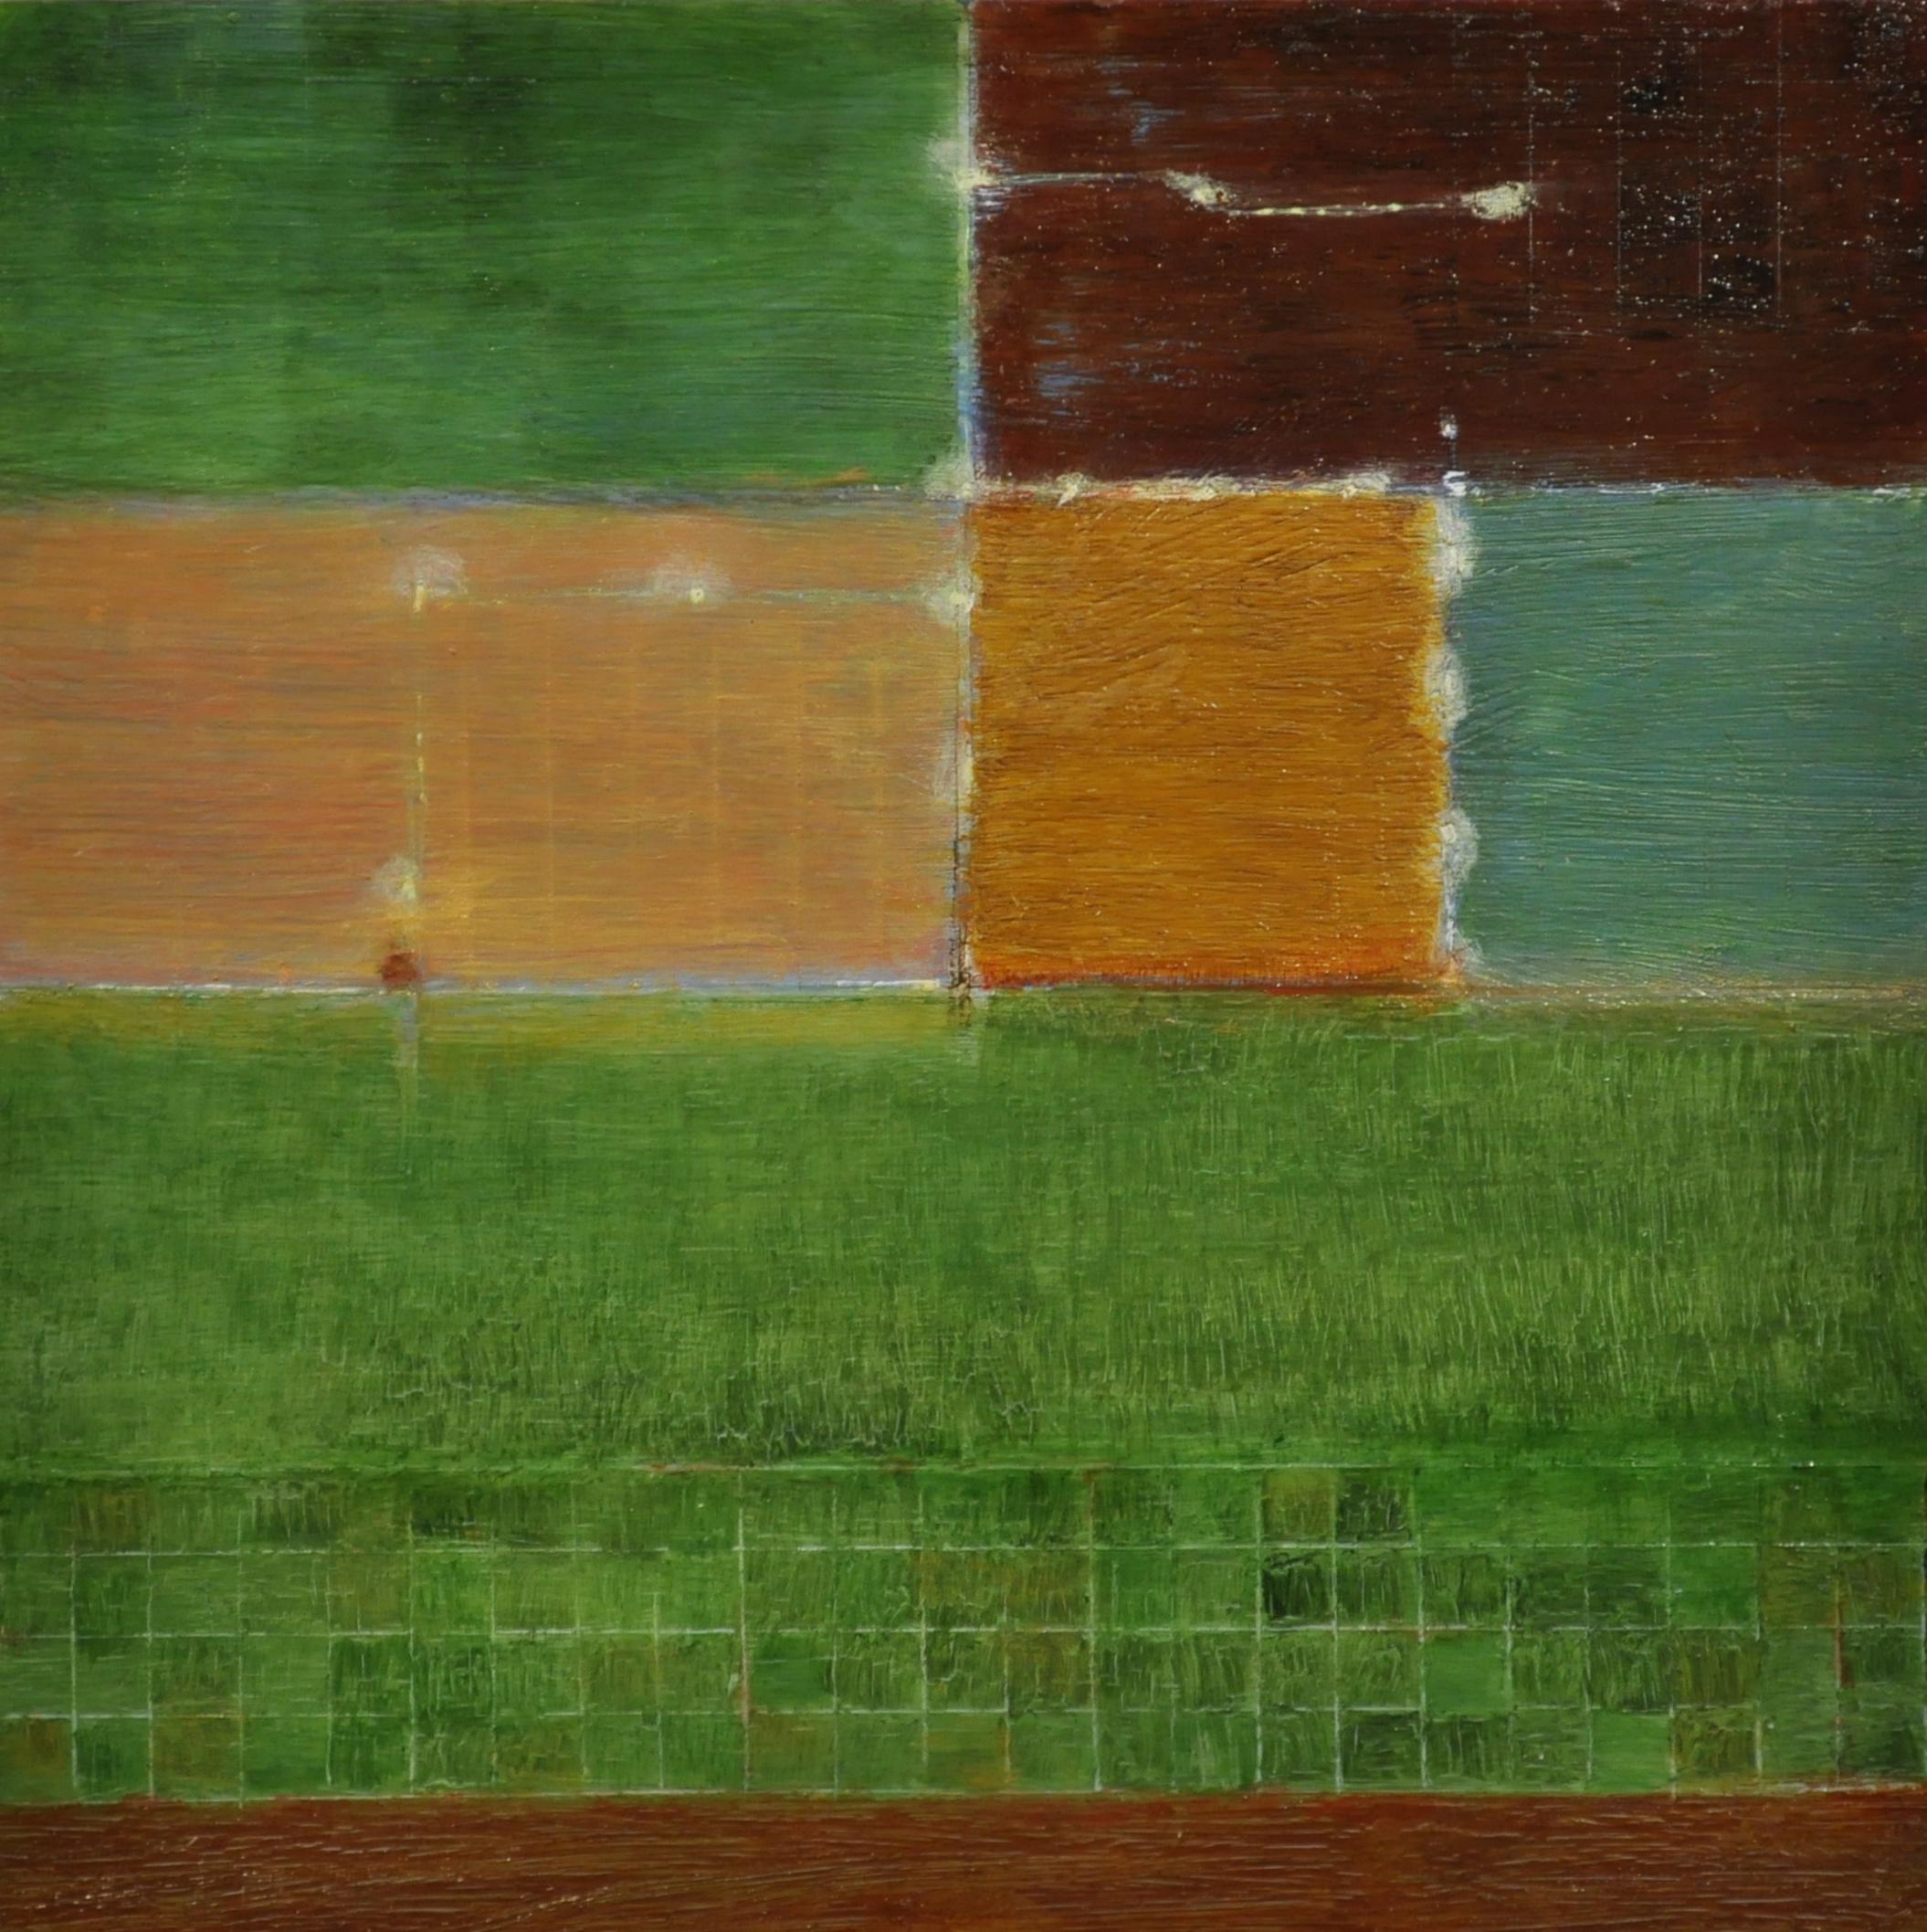 land use, 2017 oil on panel, 15.2 x 15.2 cm